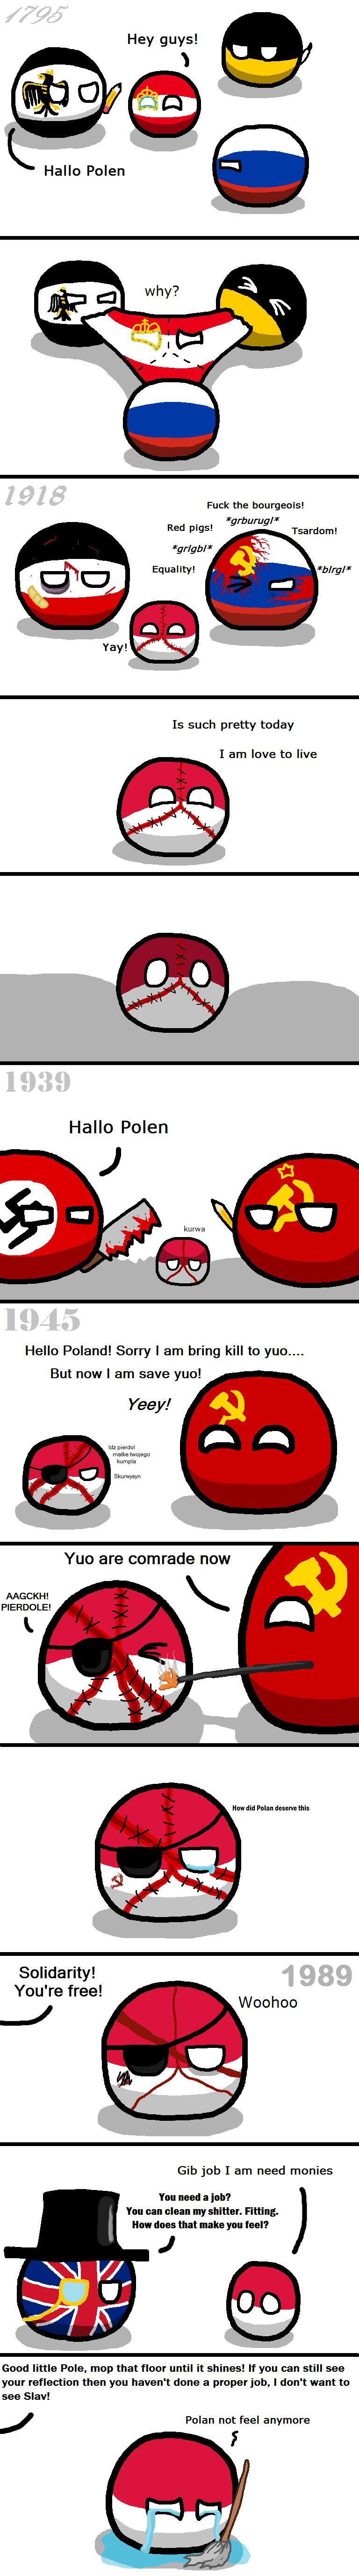 country-balls-poland-has-it-rough